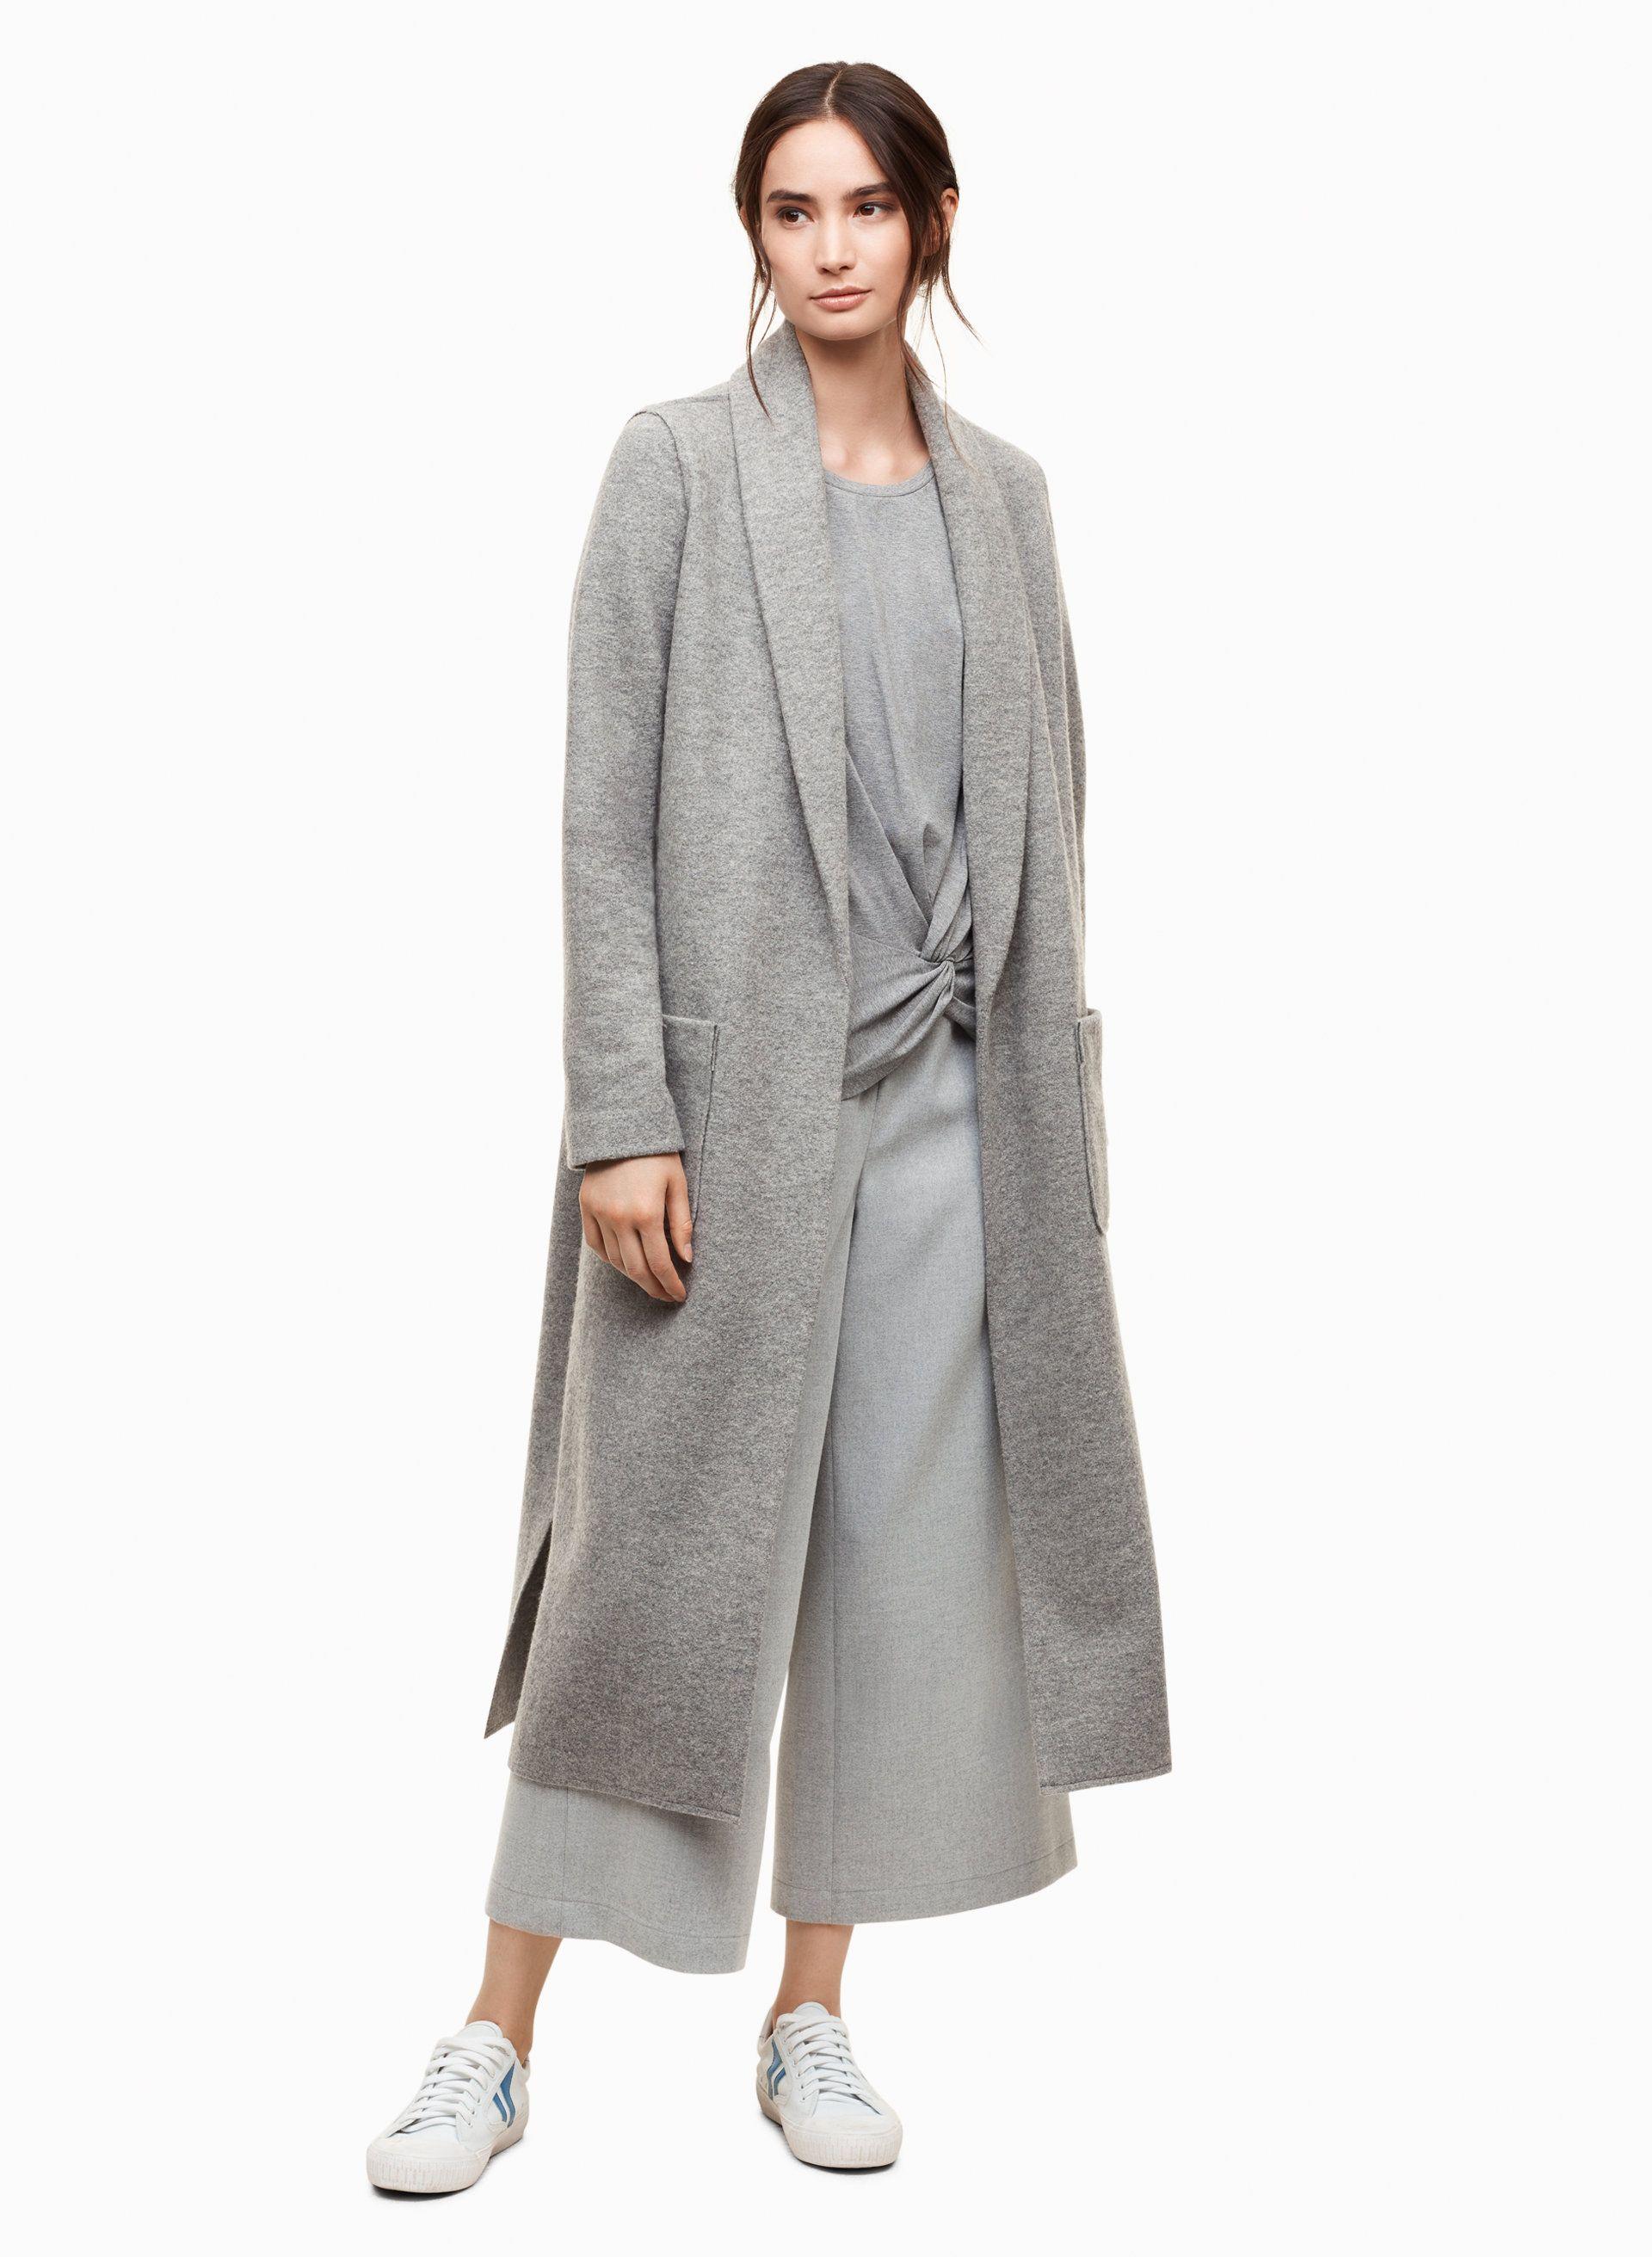 401d932bd9c4f Gornick jacket | Style | Jackets, Fashion, Fashion forever